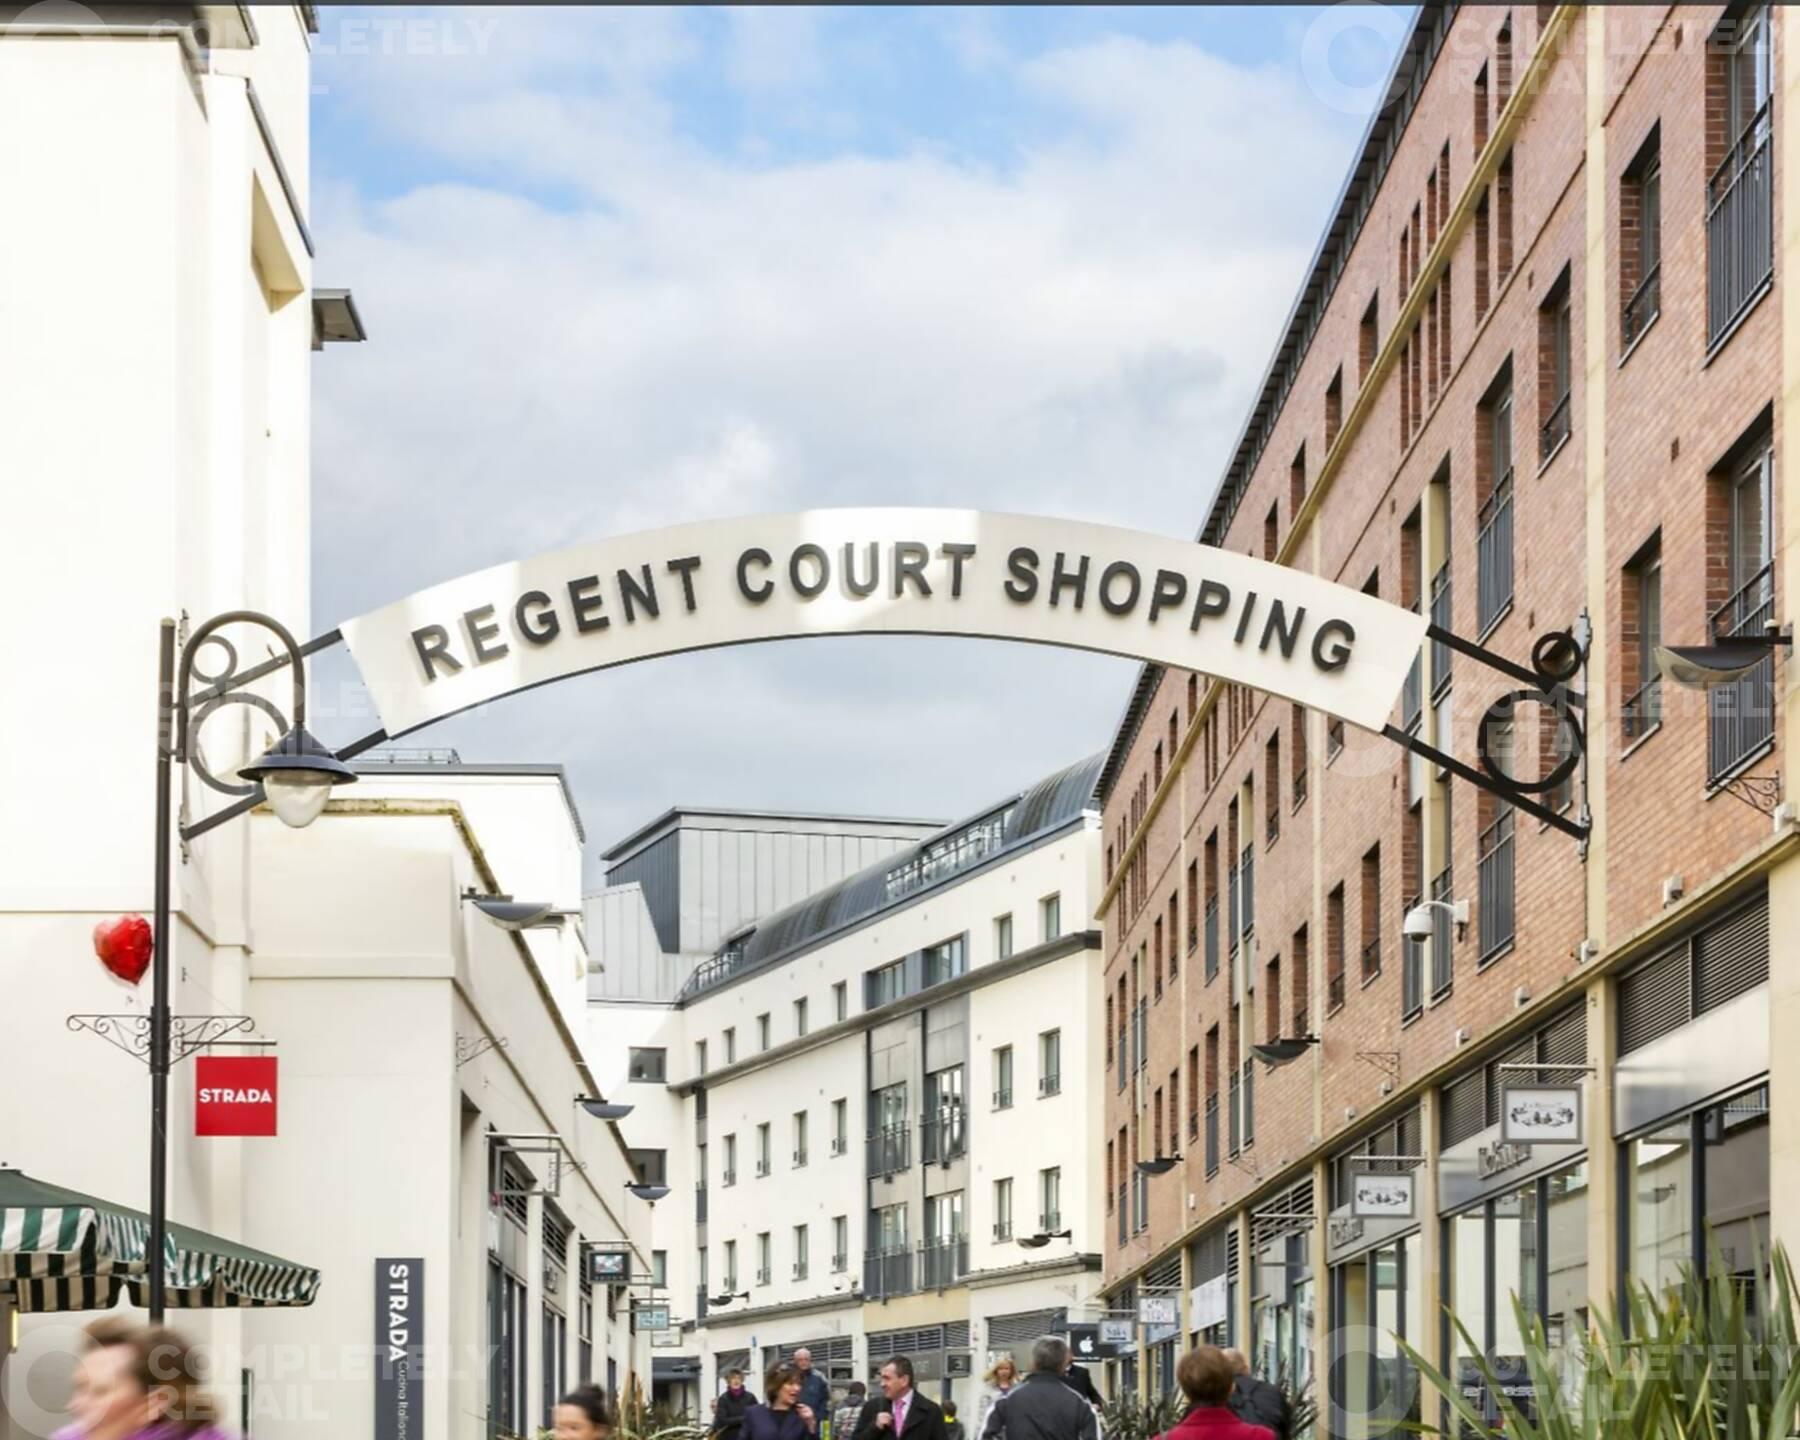 Regent Court Shopping Centre